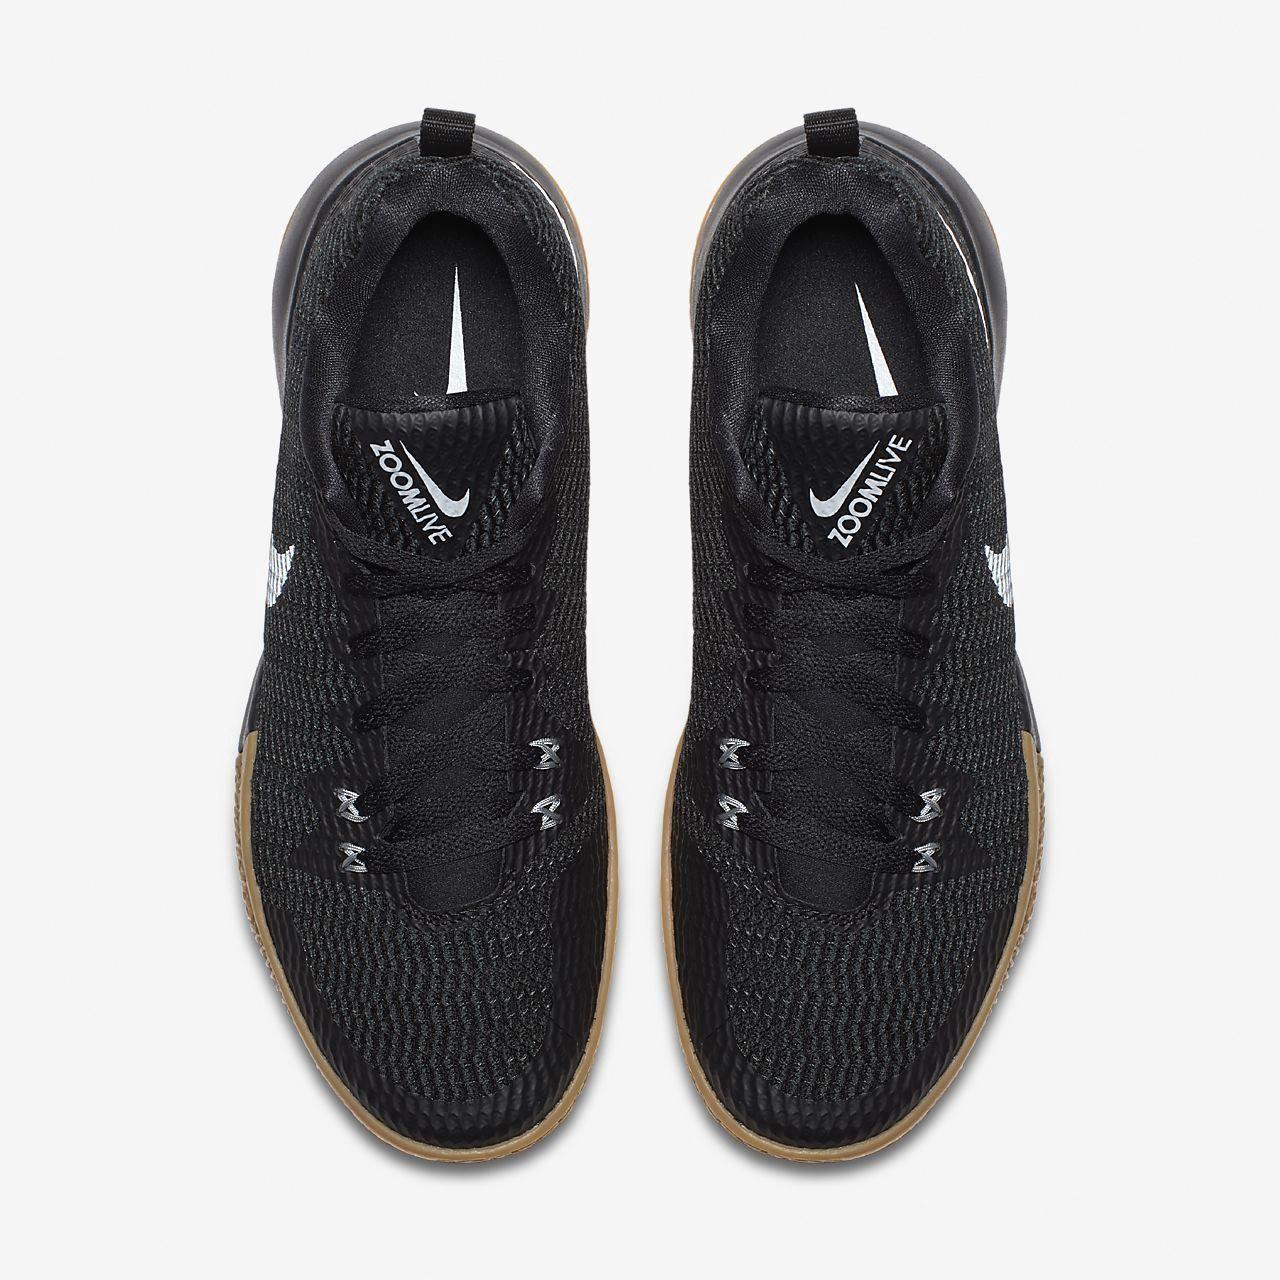 sneakers for cheap 0e038 41f73 Nike Zoom Live II Mens Basketball Shoe - 9.5 Silver basketballgamestoday